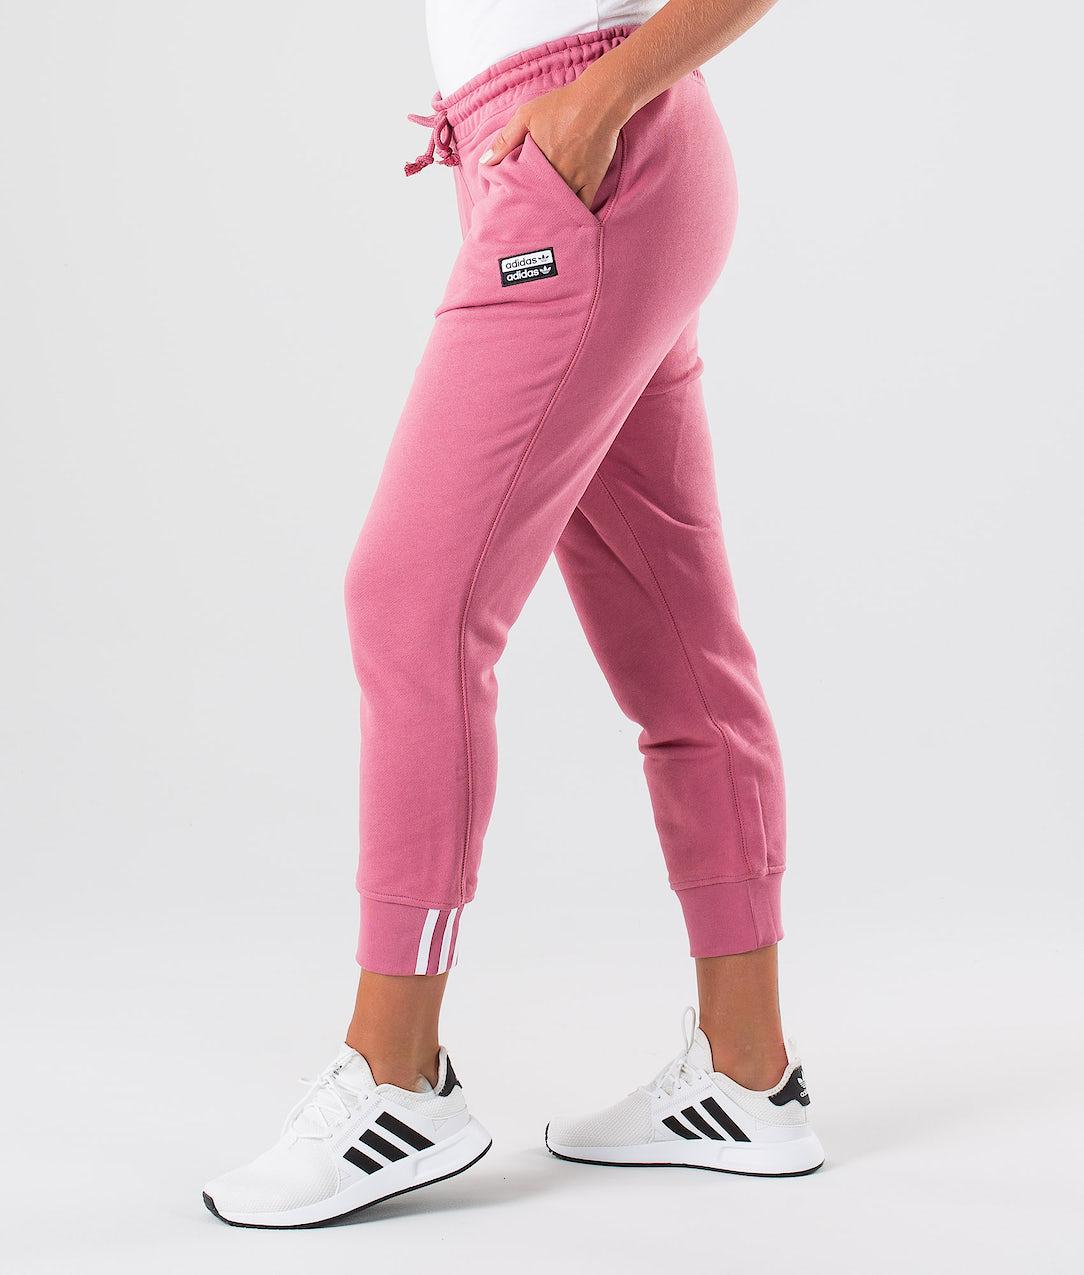 stor försäljning många fashionabla grossisthandlare Adidas Originals Pant Pants Trace Maroon - Ridestore.com